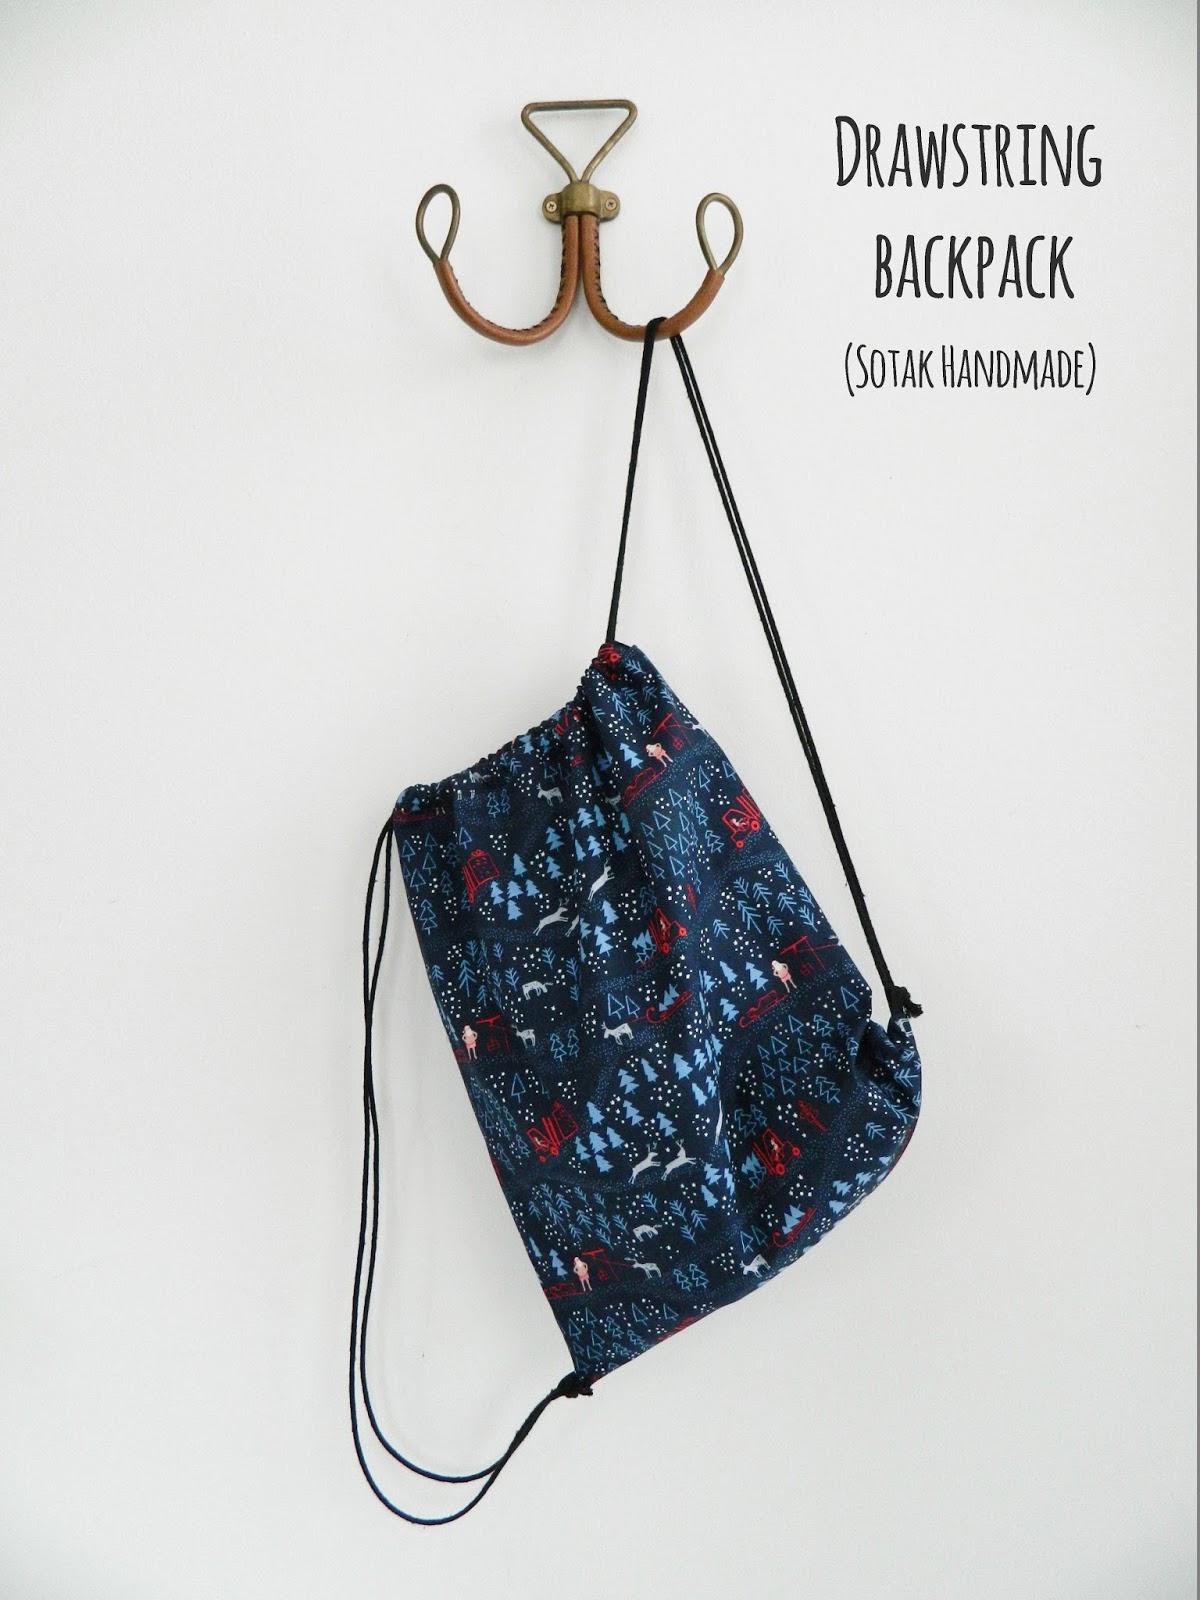 S O T A K Handmade Drawstring Backpack A Free Tutorial